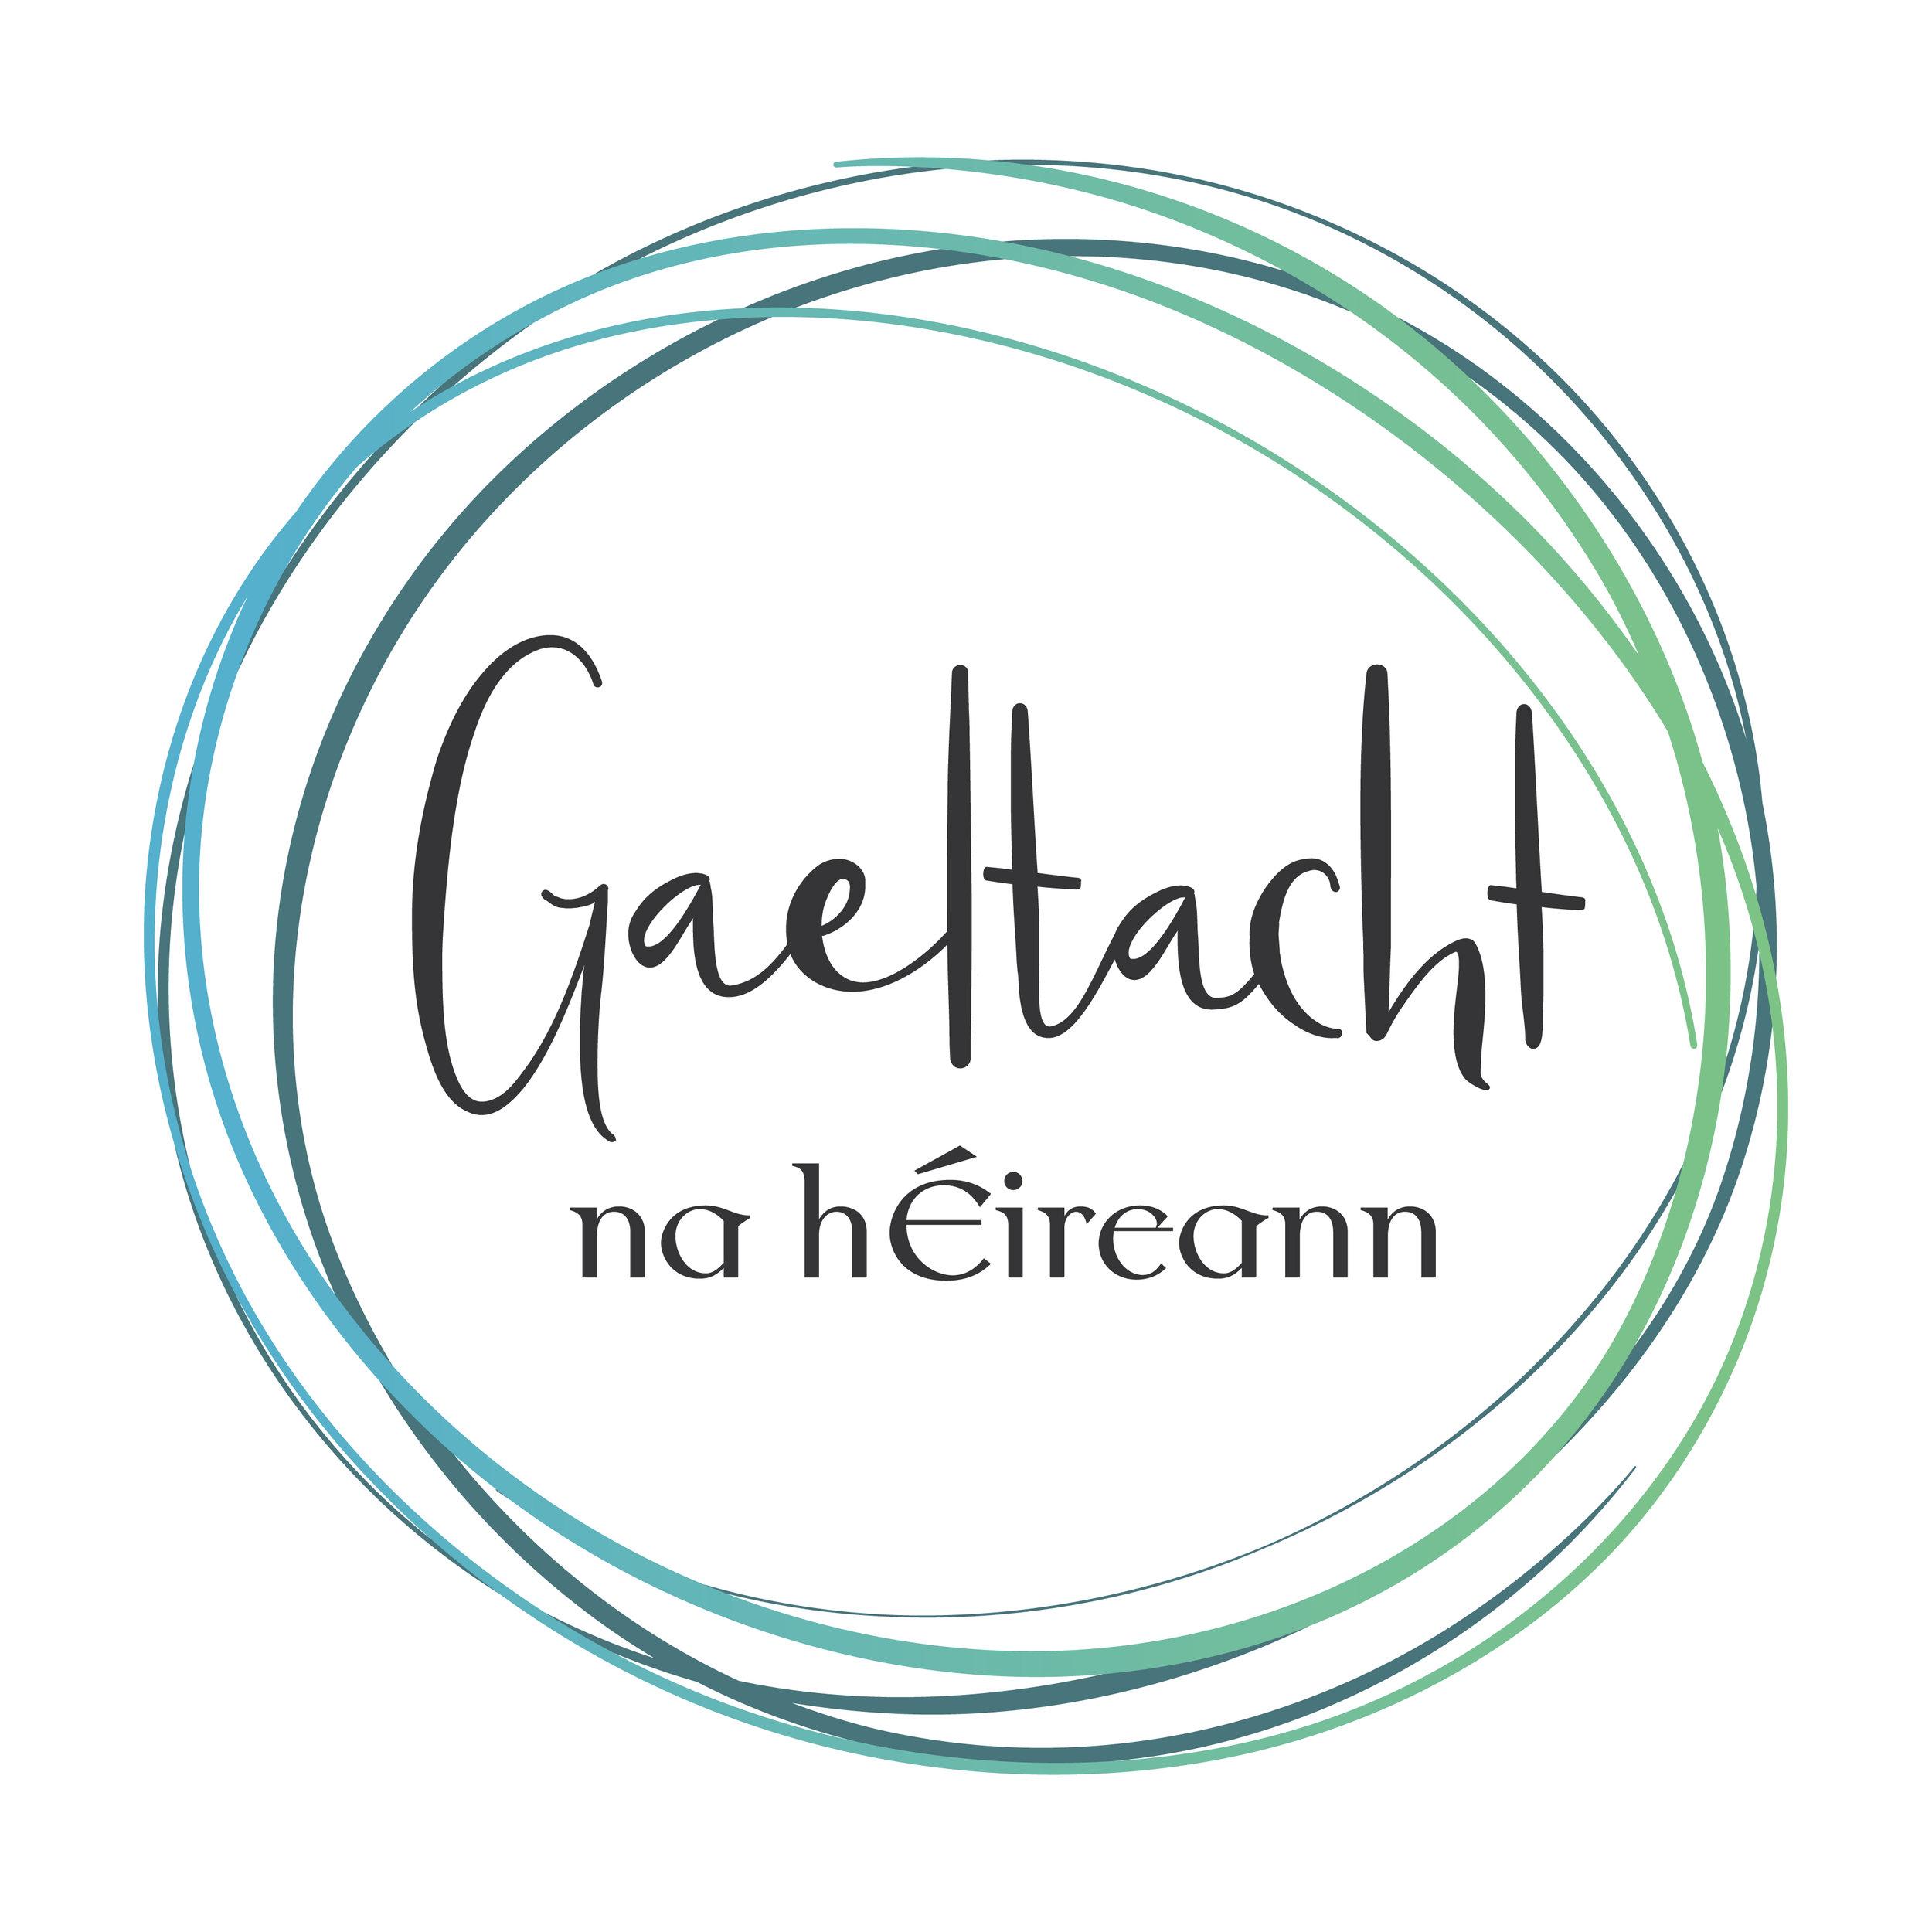 Gaeltacht_4_1_high res.jpg